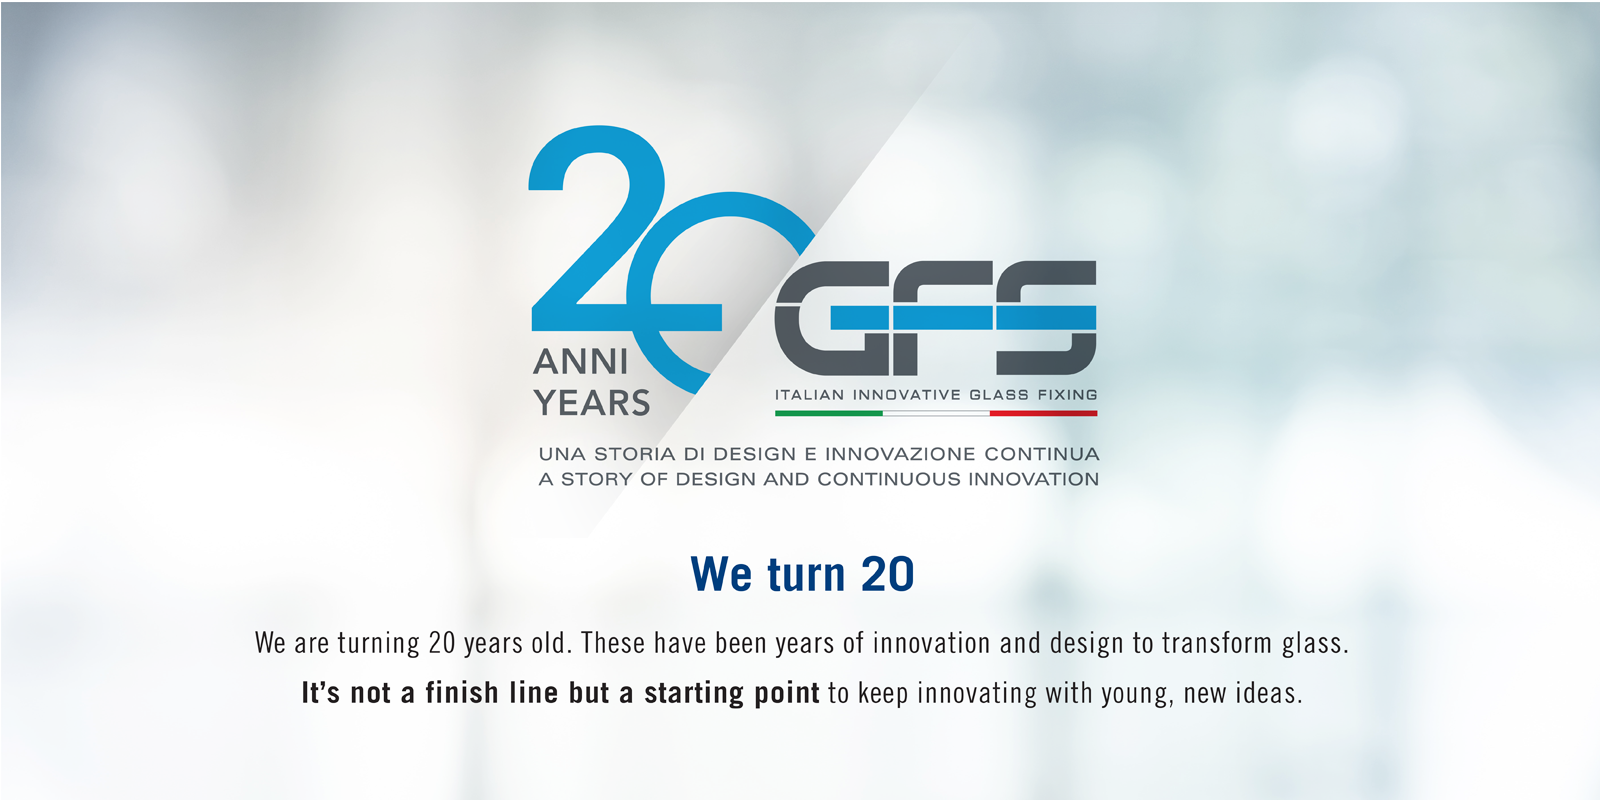 GFS 20 years